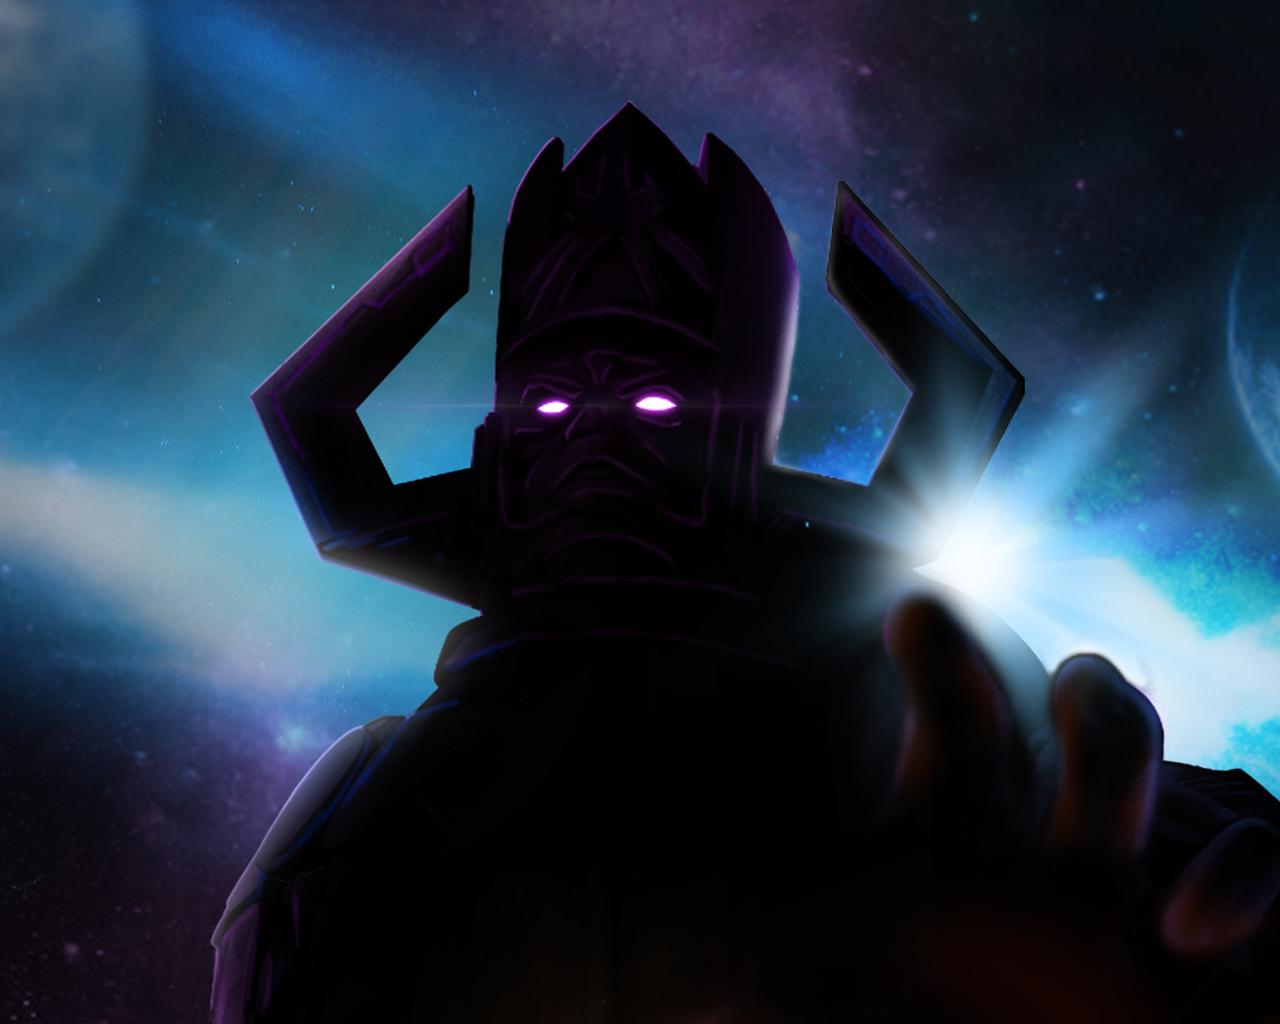 galactus-vs-captain-marvel-rk.jpg